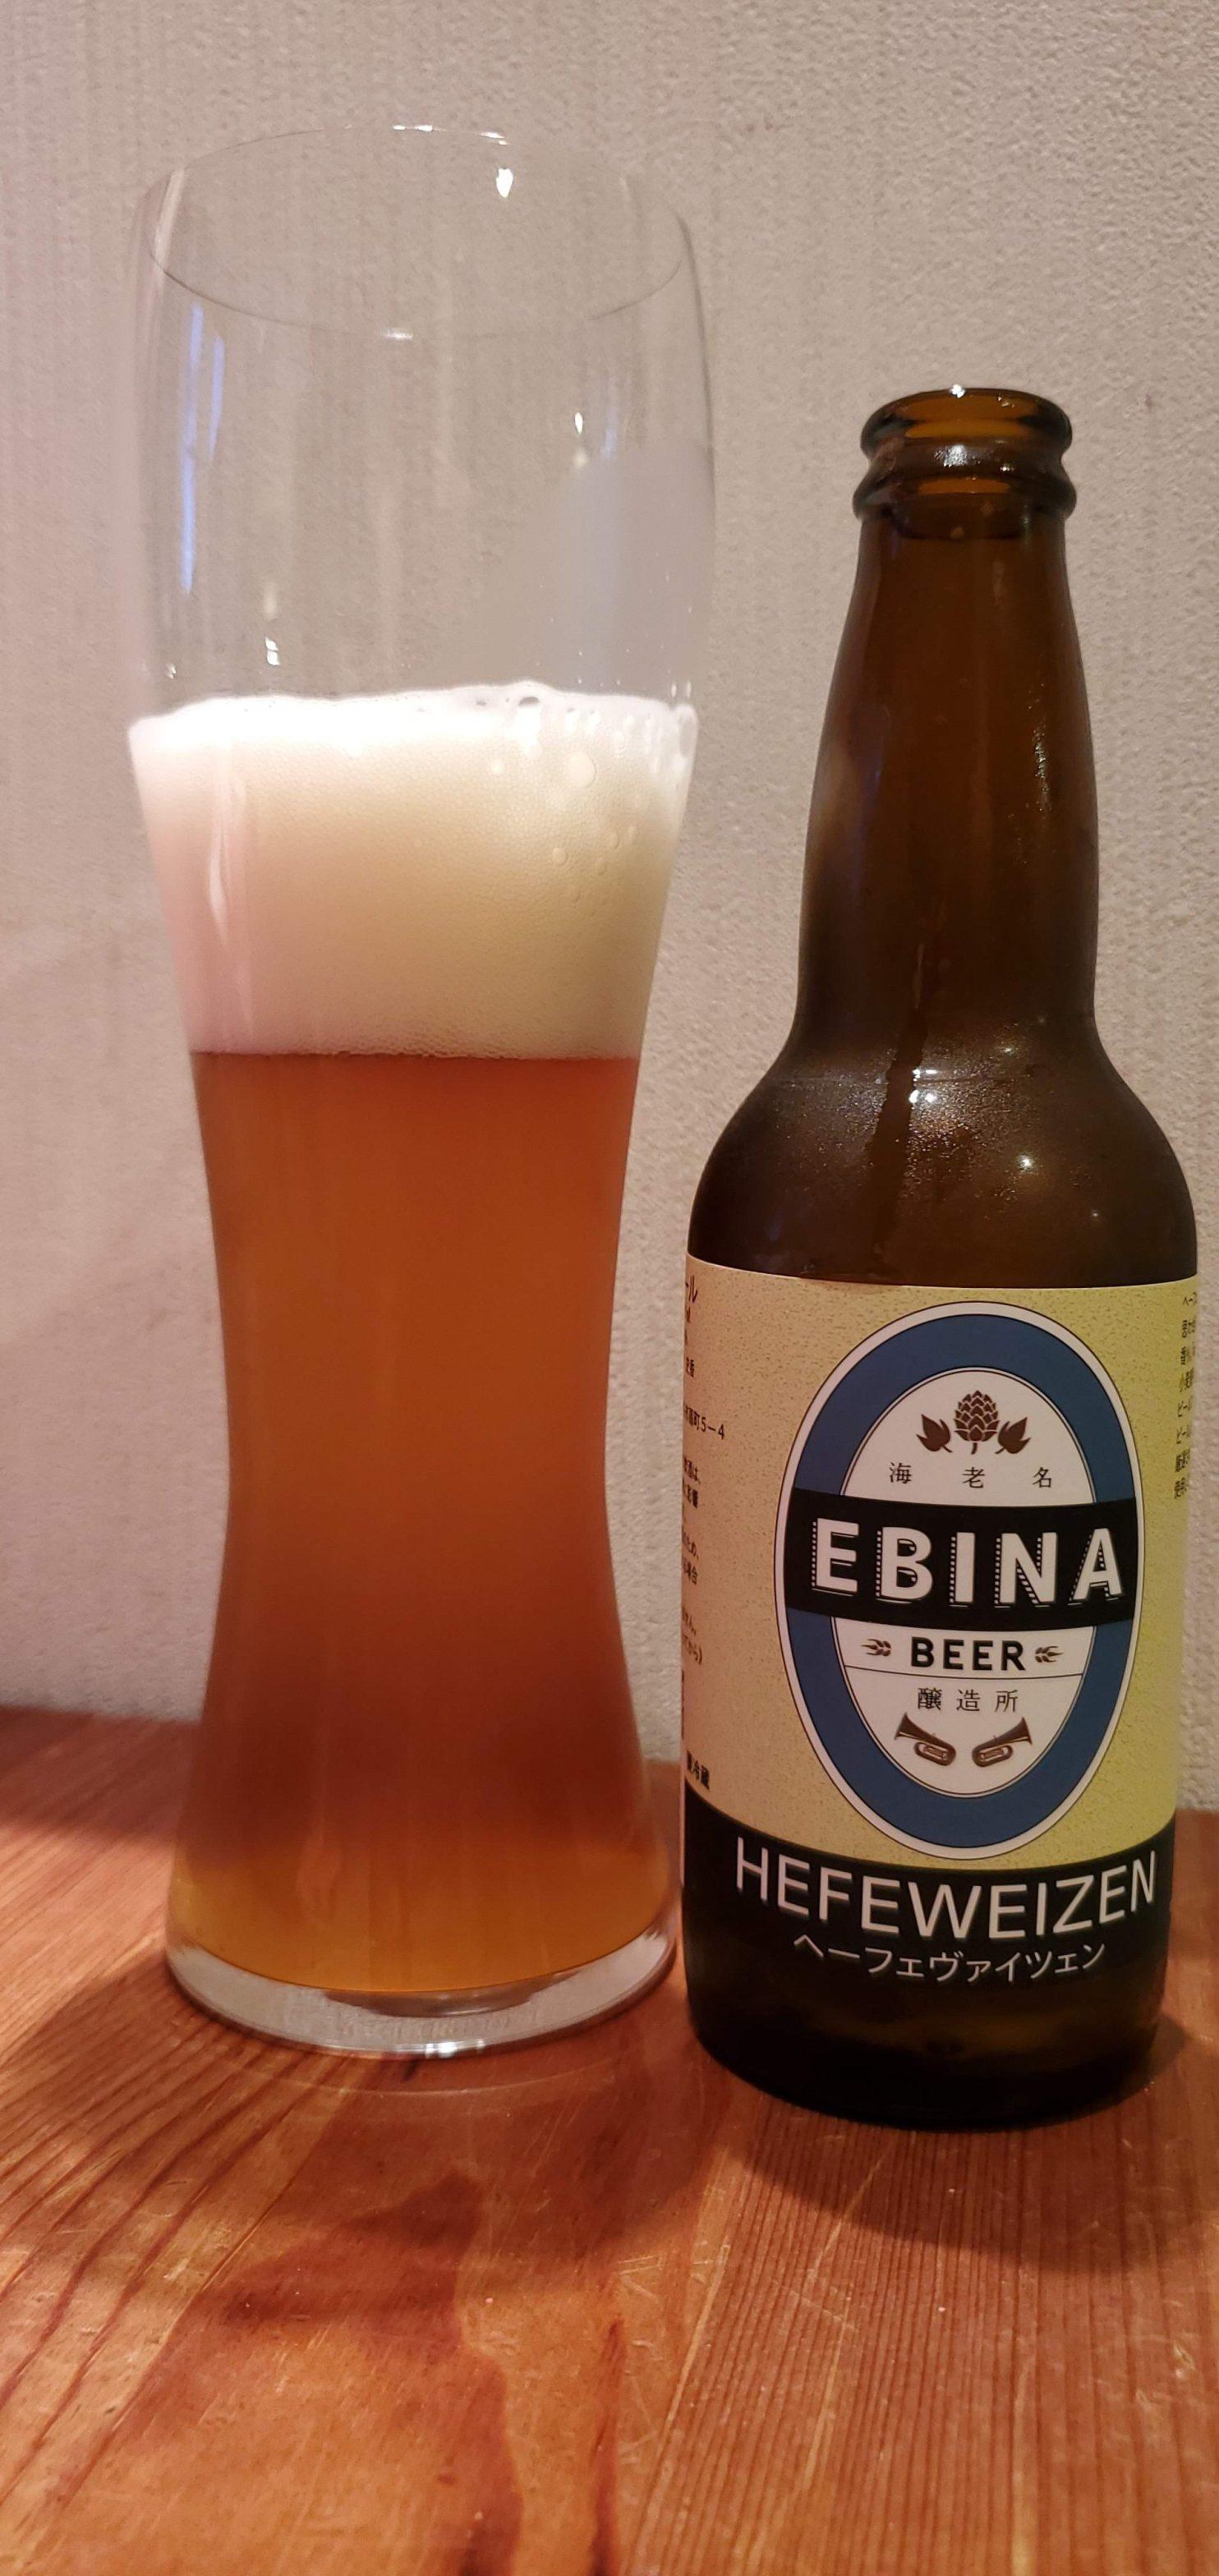 Ebina Hefeweizen・海老名へフェヴァイツェン